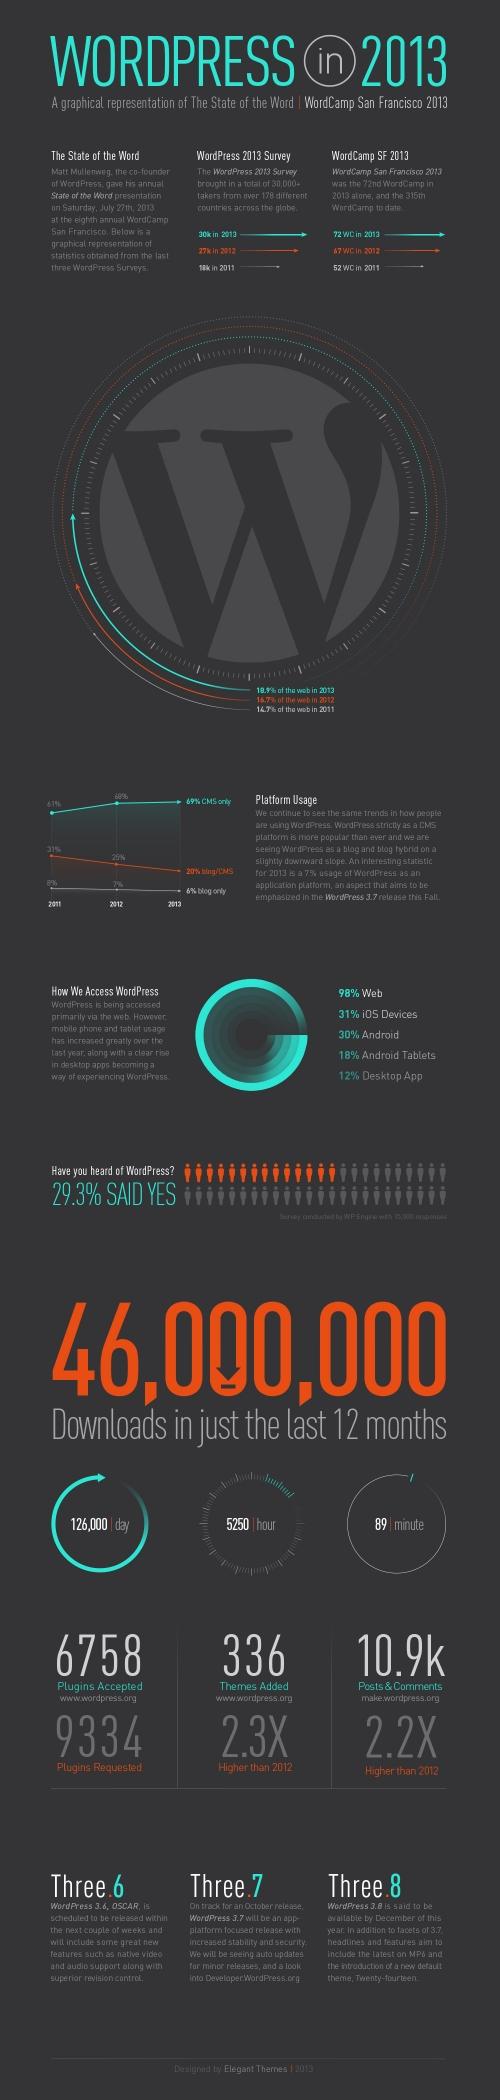 WordPress в 2013 - инфографика   n-wp.ru